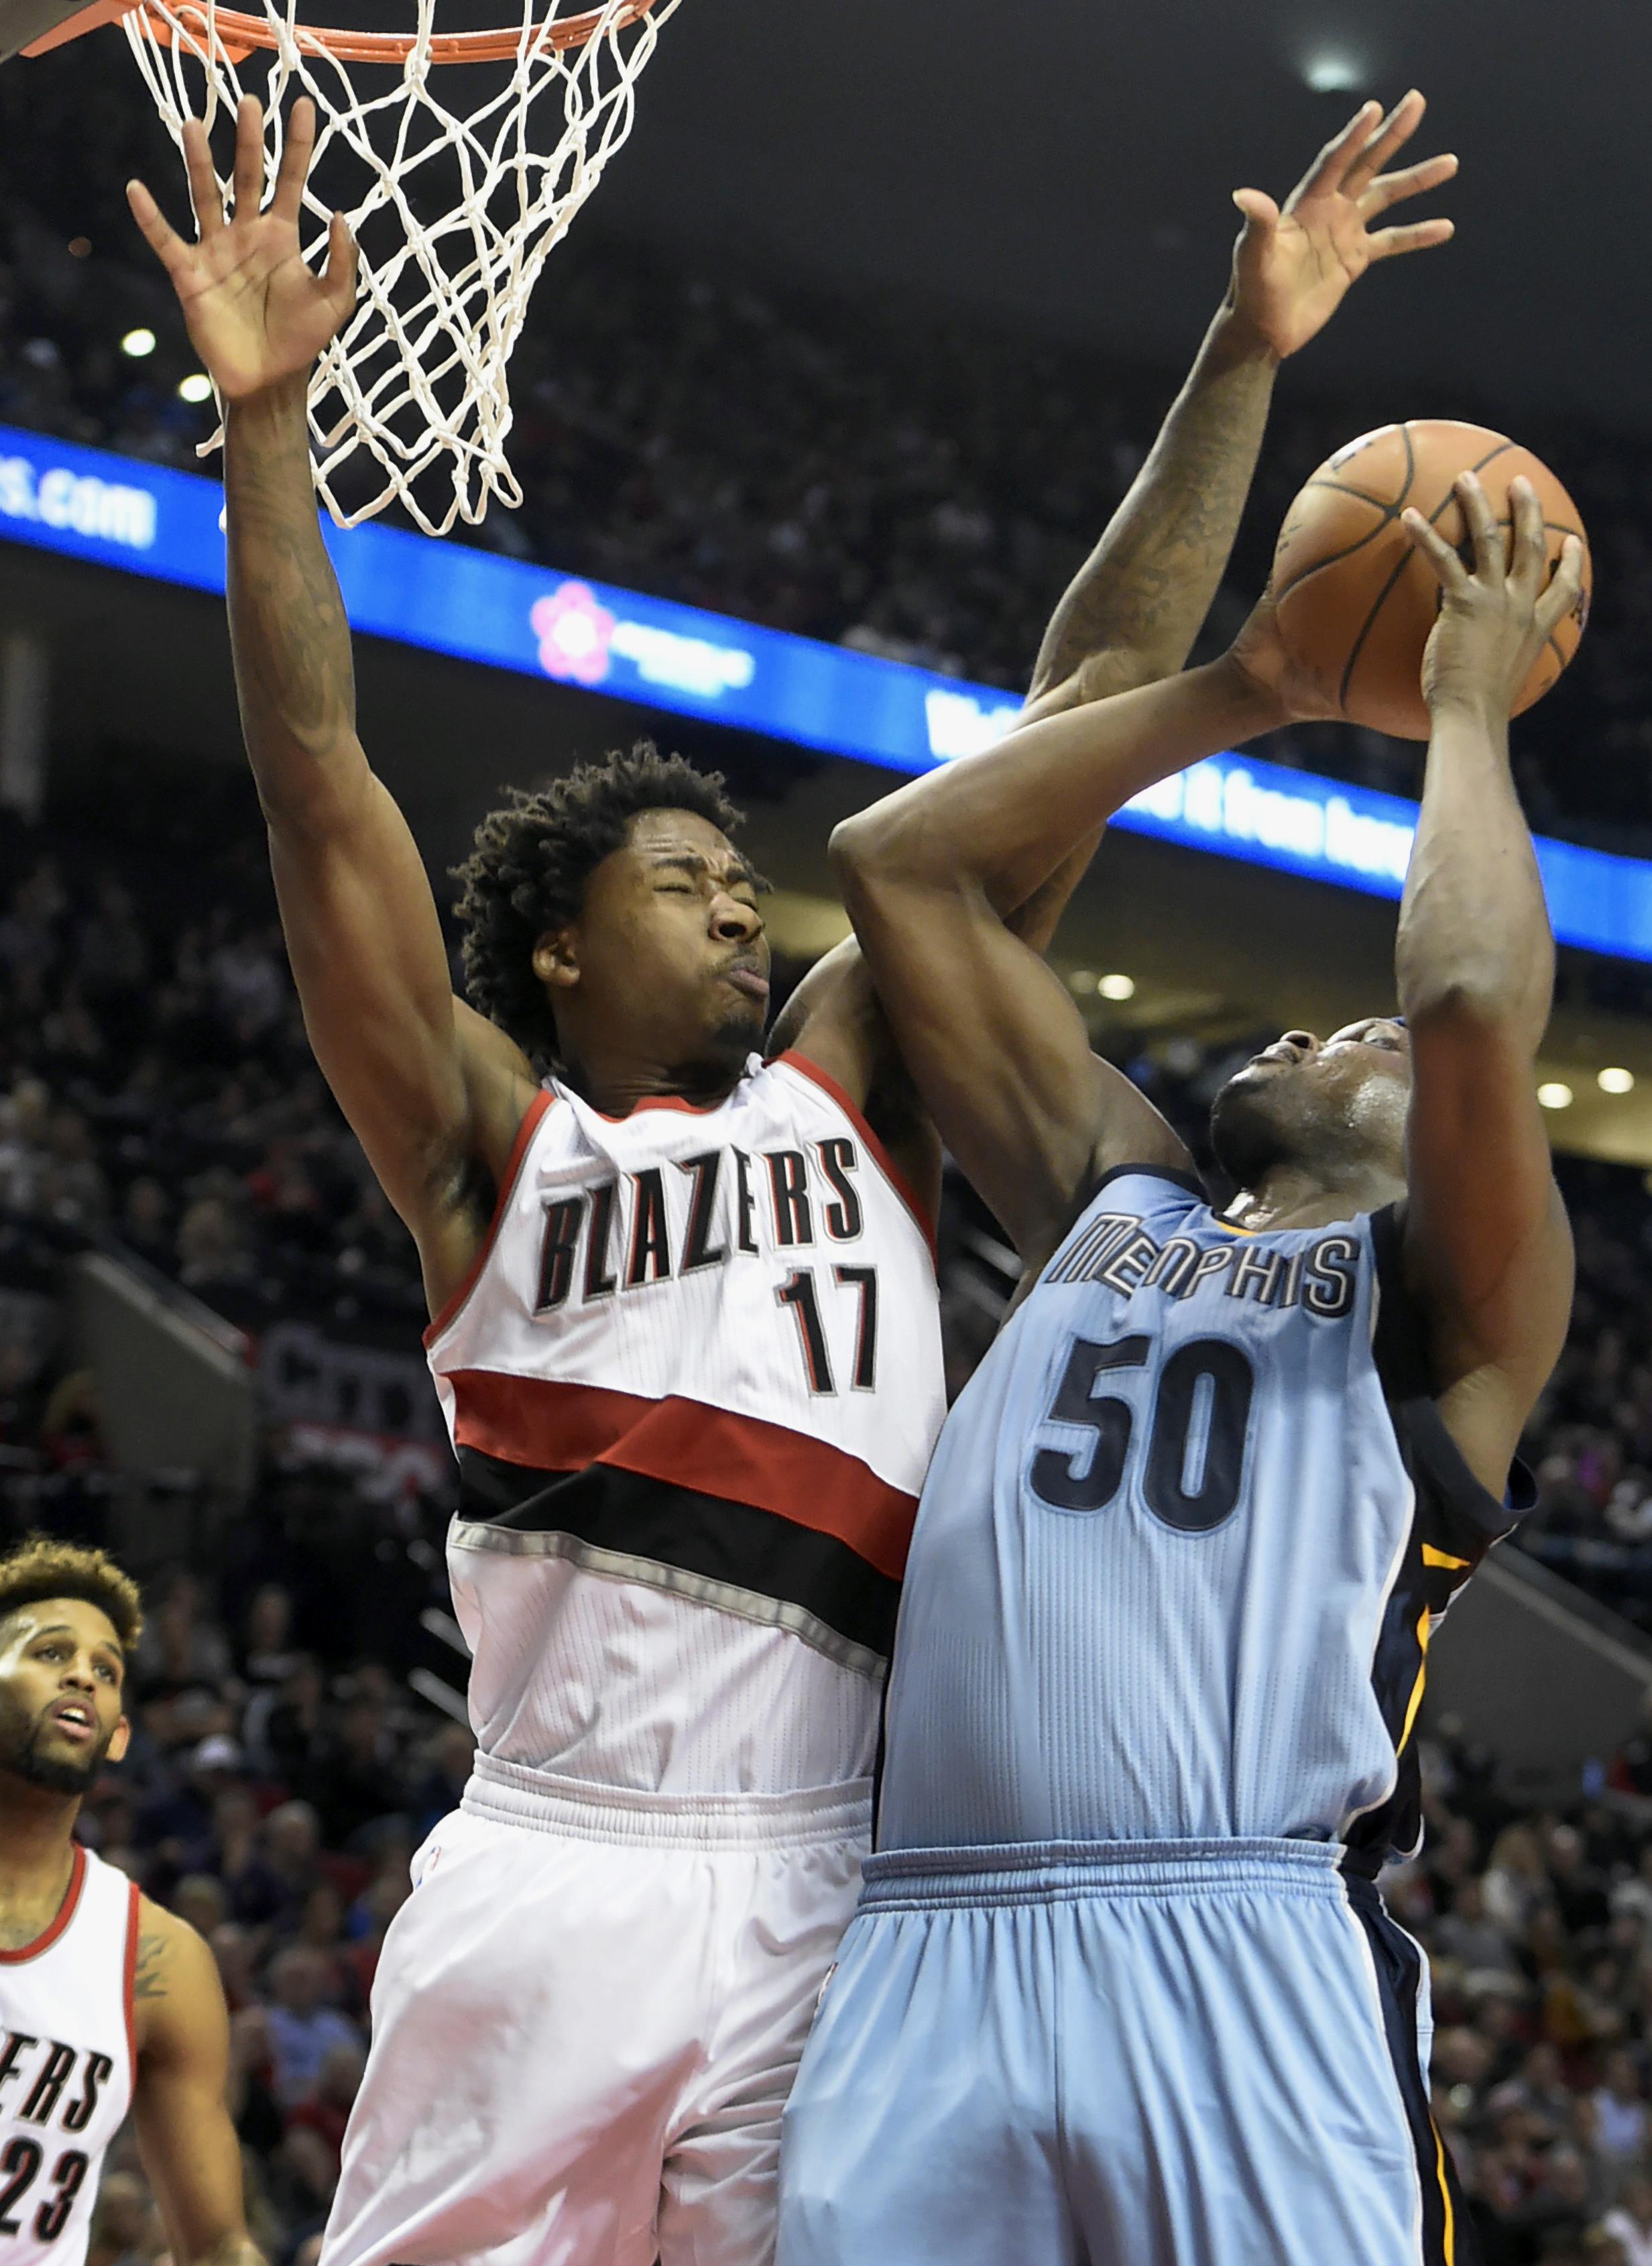 Zach randolph memphis grizzlies - Memphis Grizzlies Forward Zach Randolph 50 Shoots Against Portland Trail Blazers Center Ed Davis